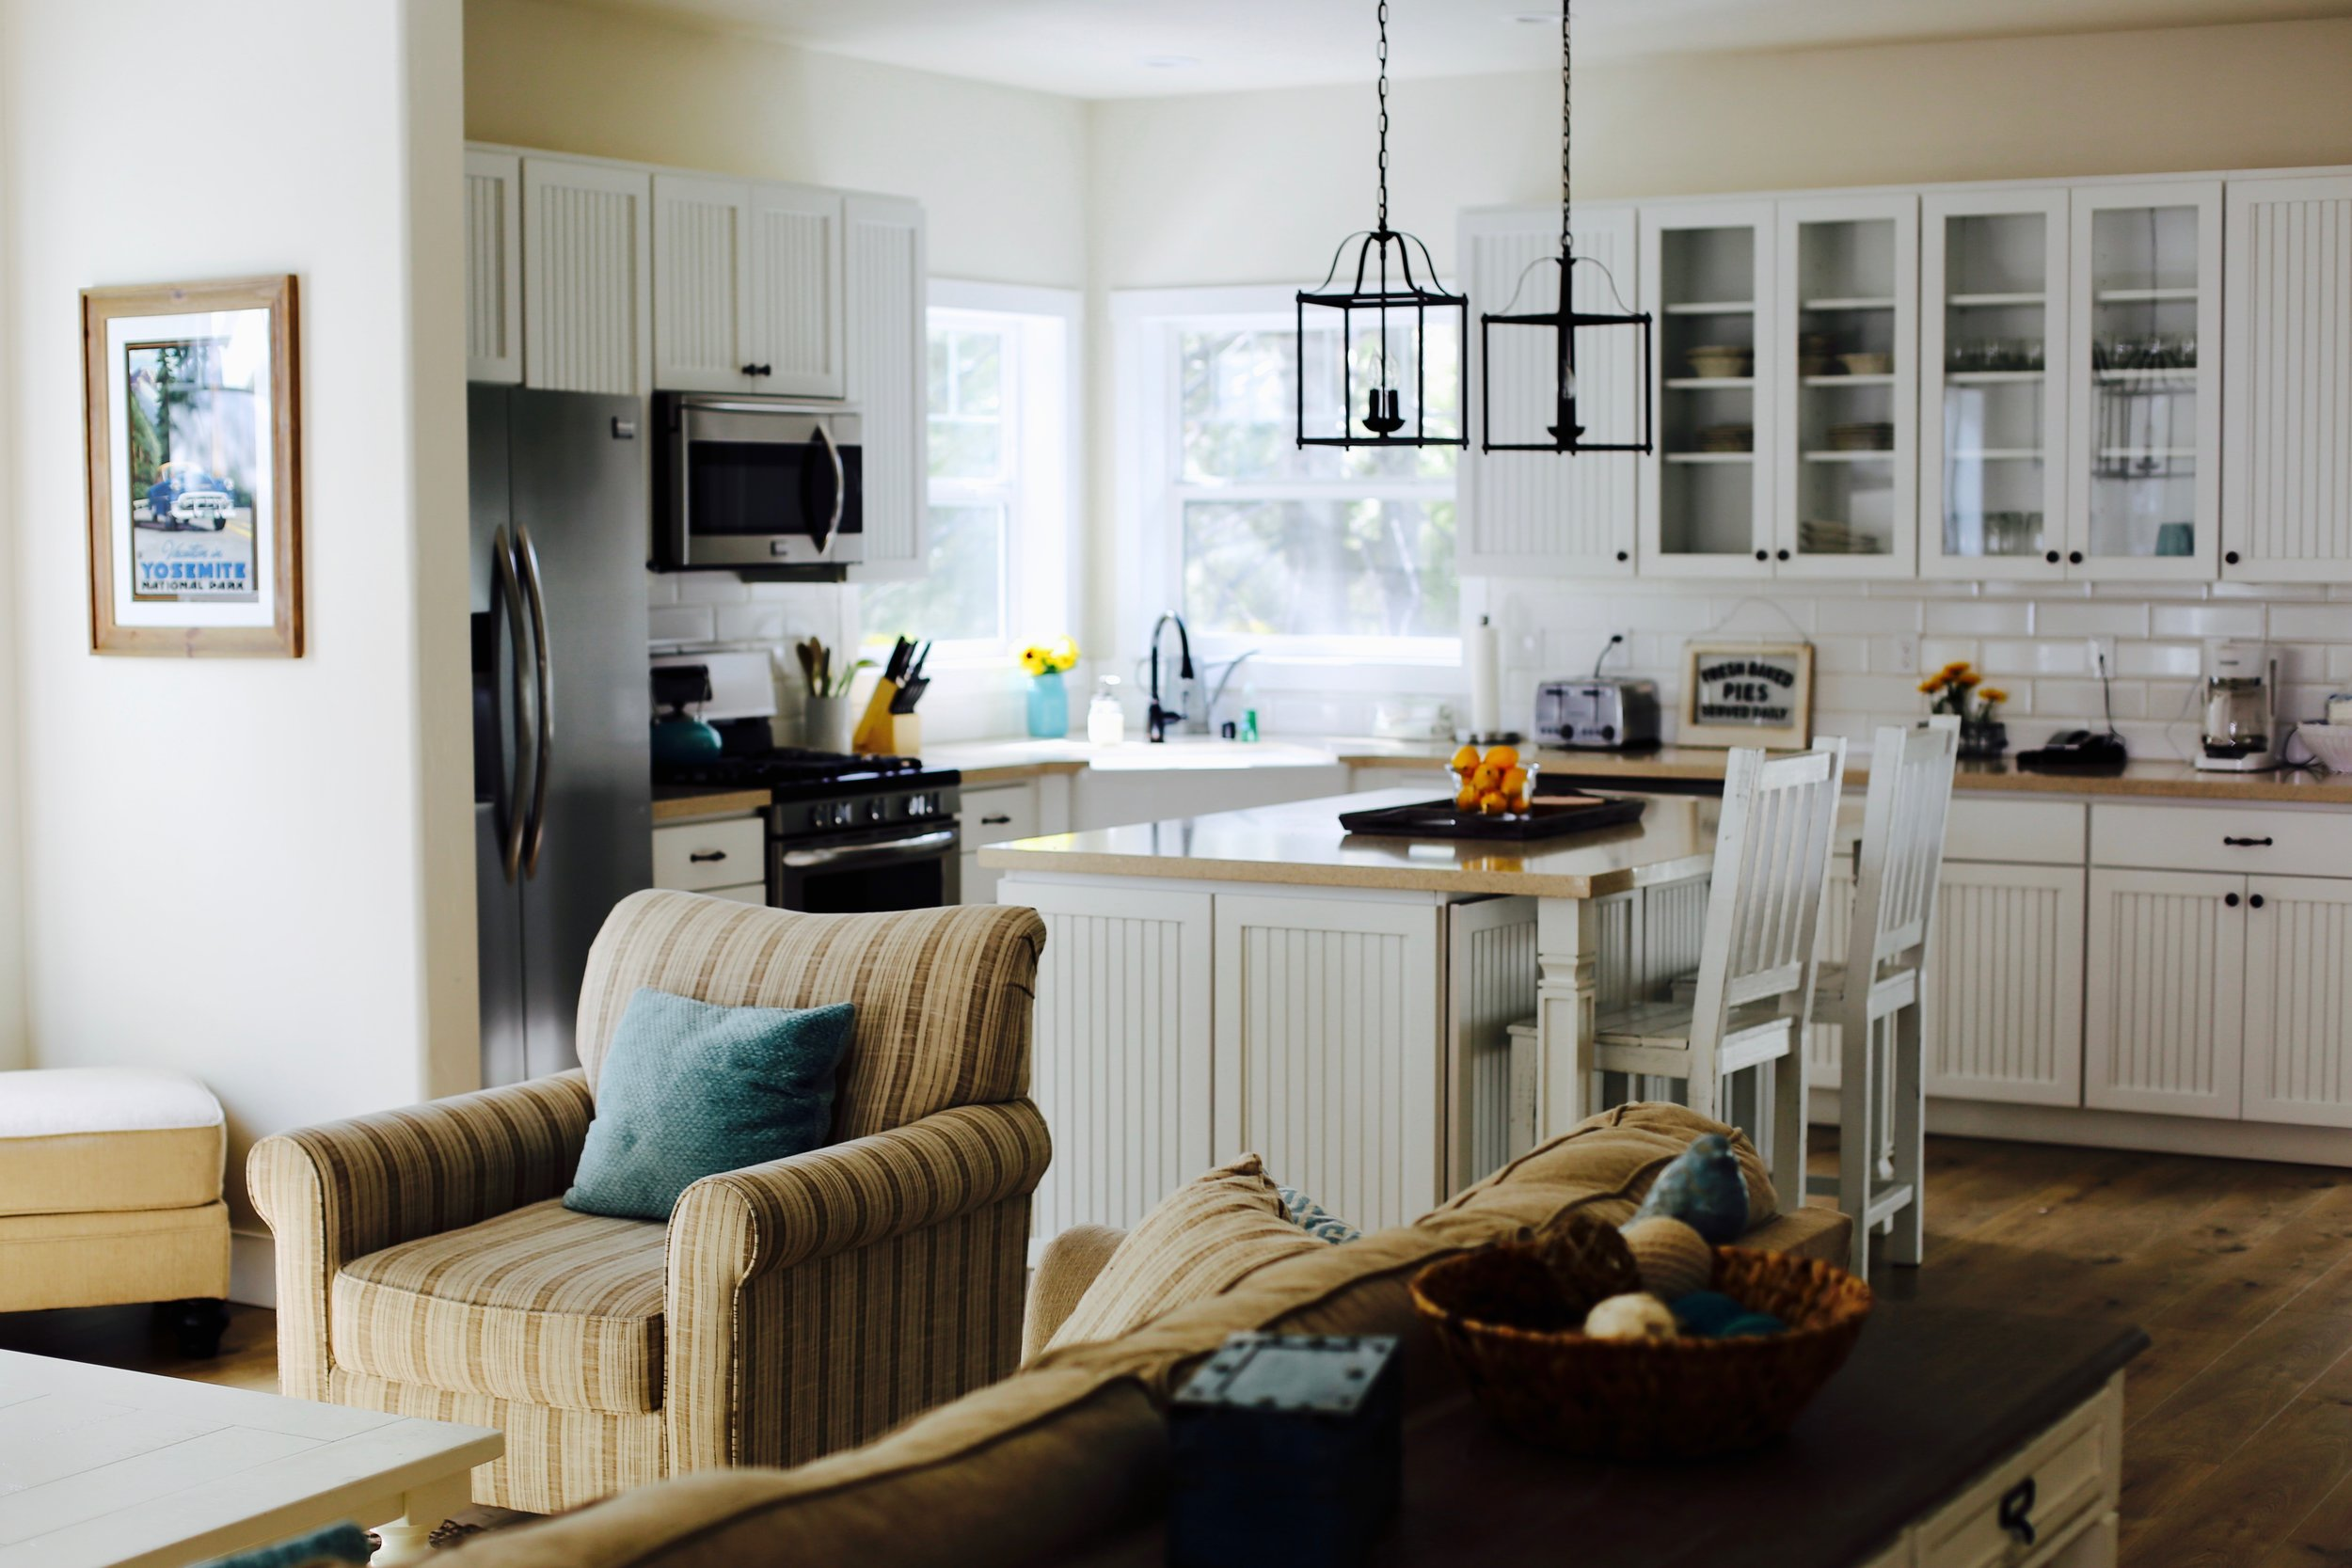 yosemite-airbnb.jpg